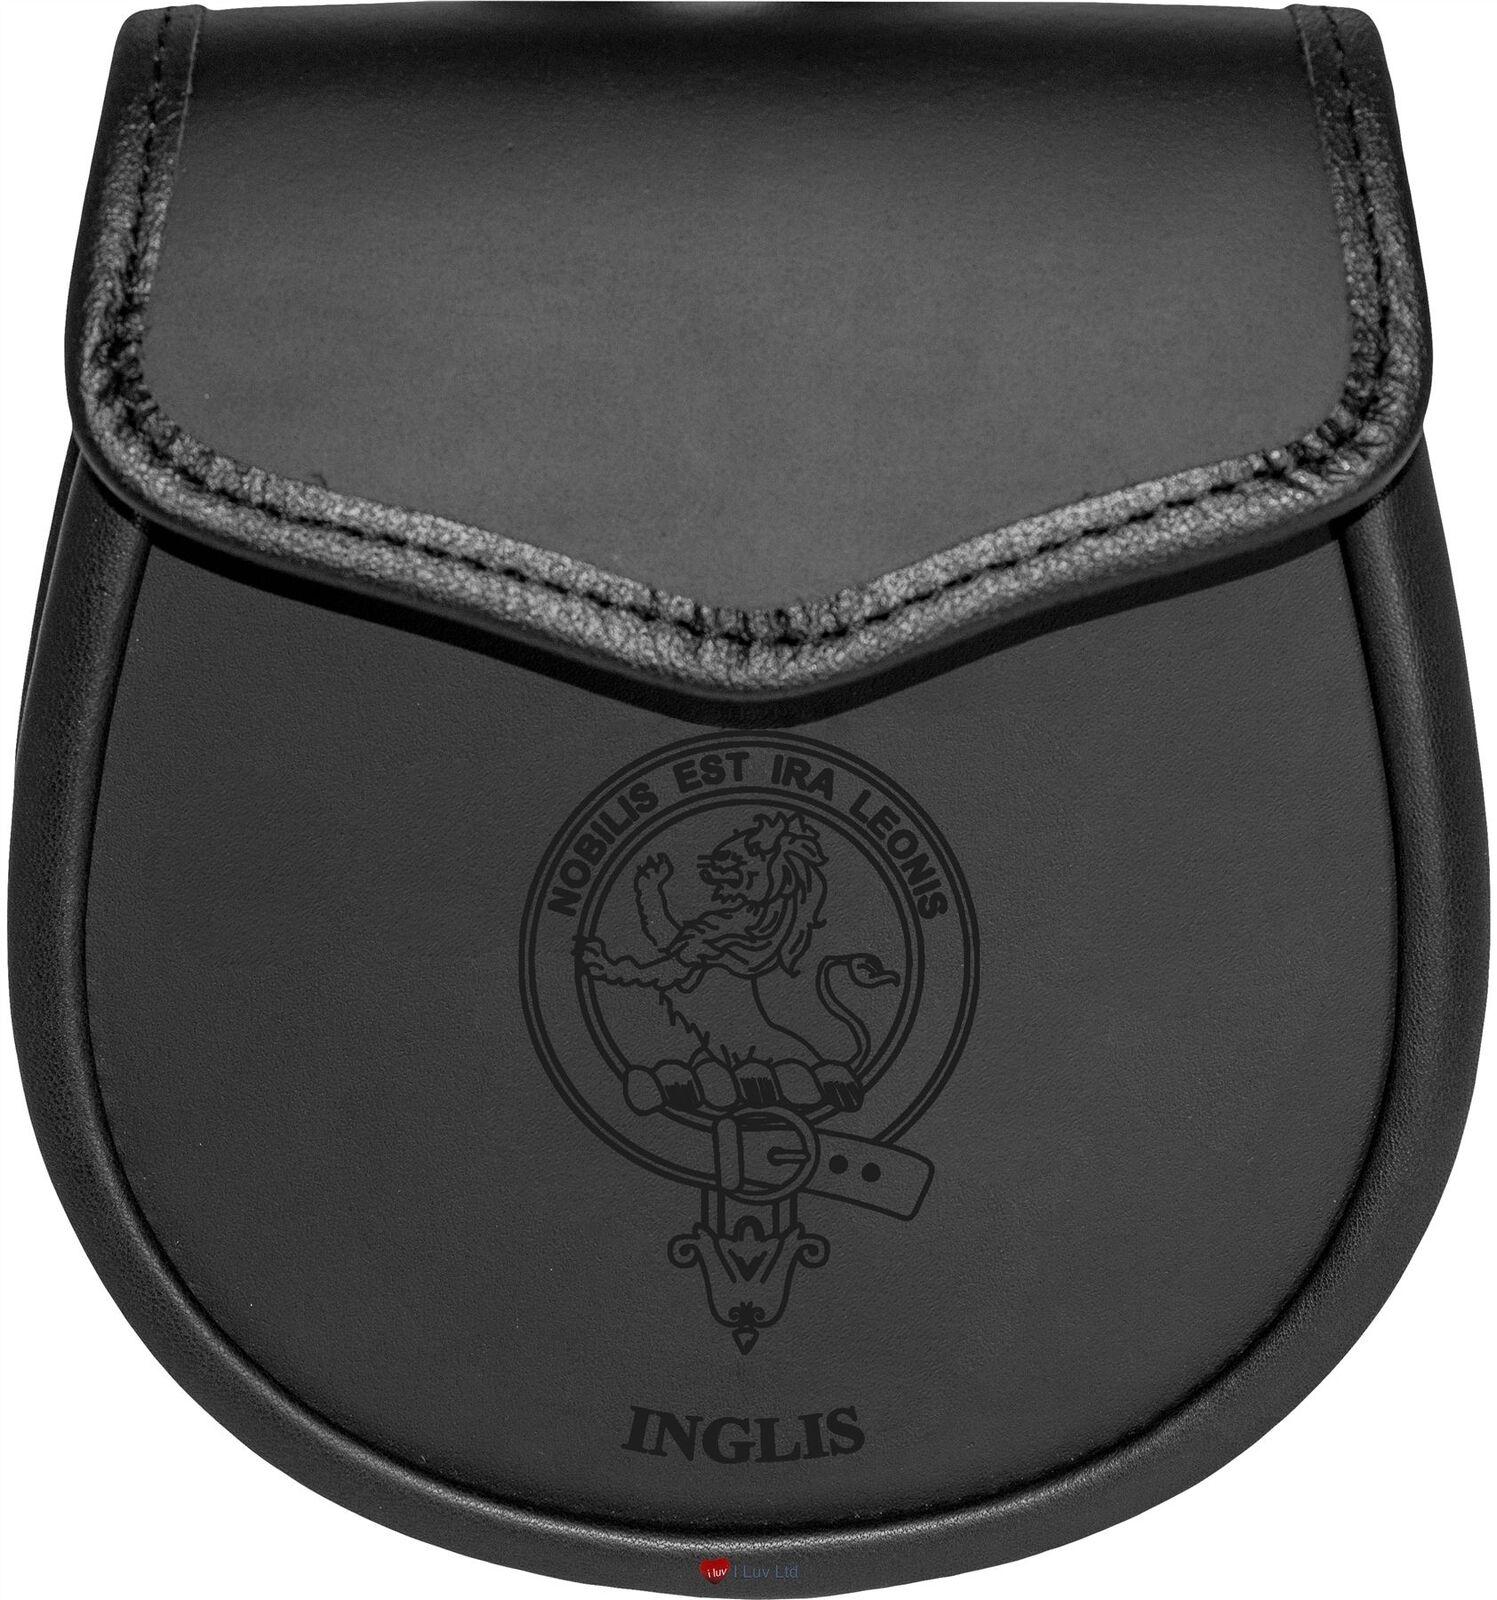 Inglis Leather Day Sporran Scottish Clan Crest